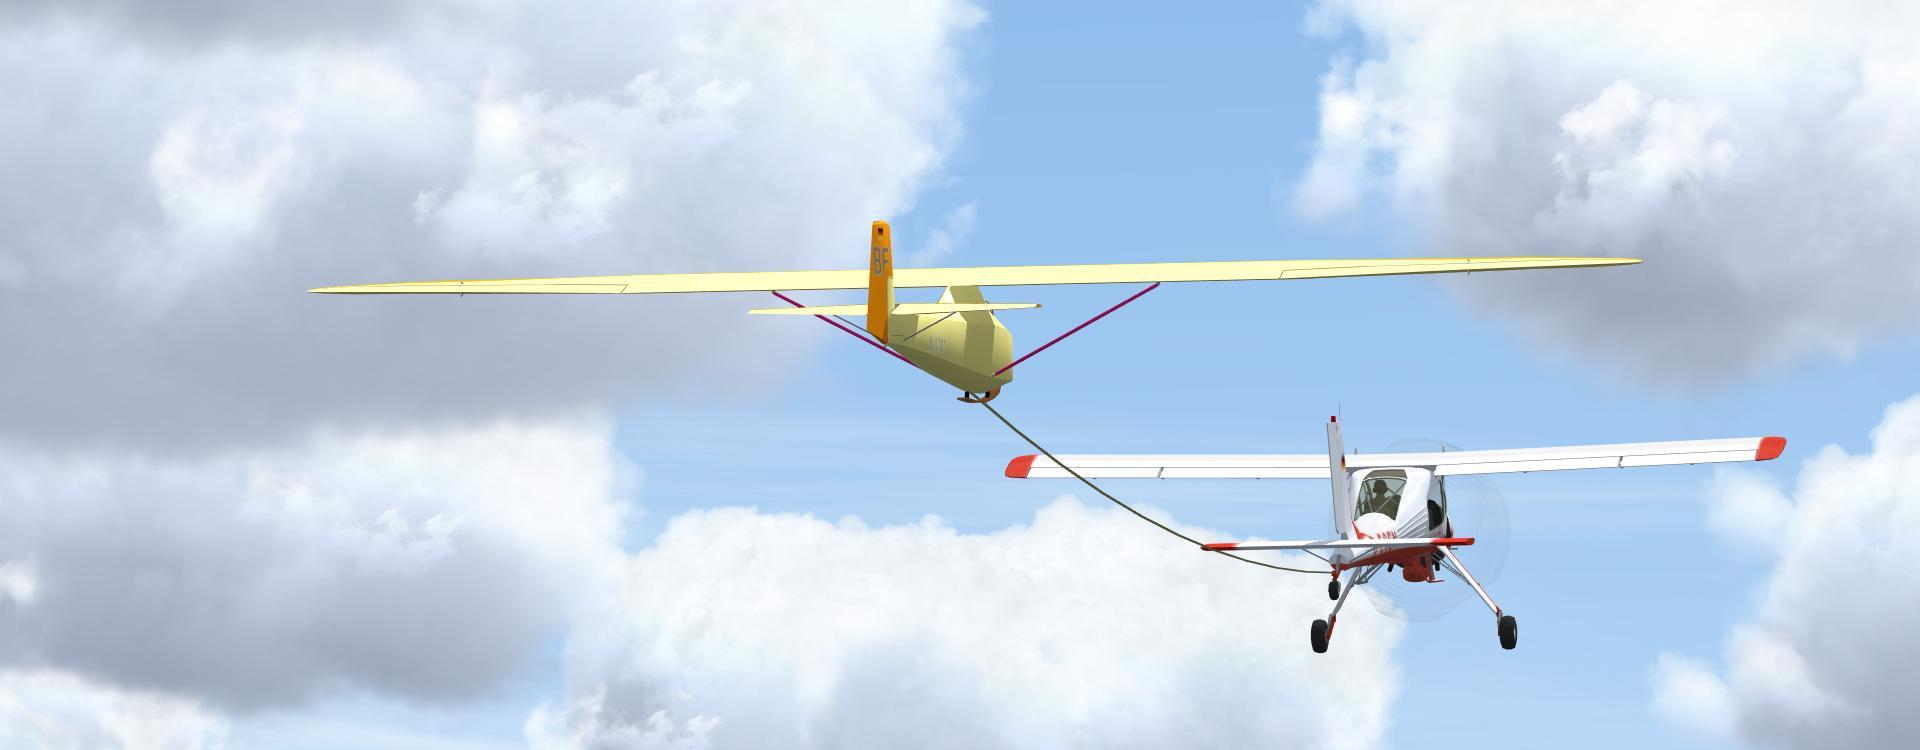 beste fsx flugzeuge